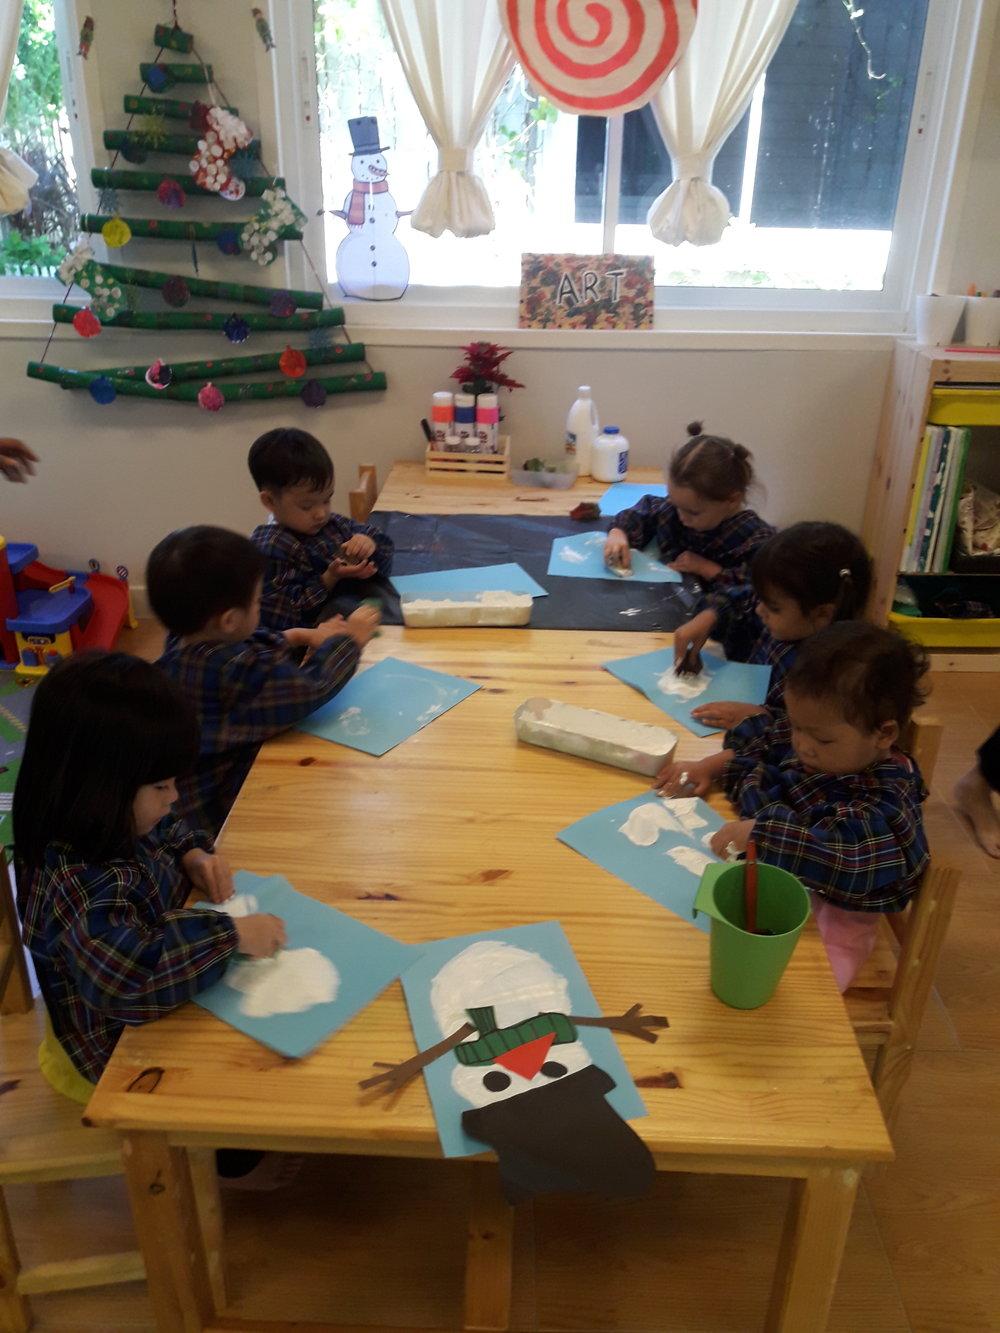 Our snowman art activitiy!